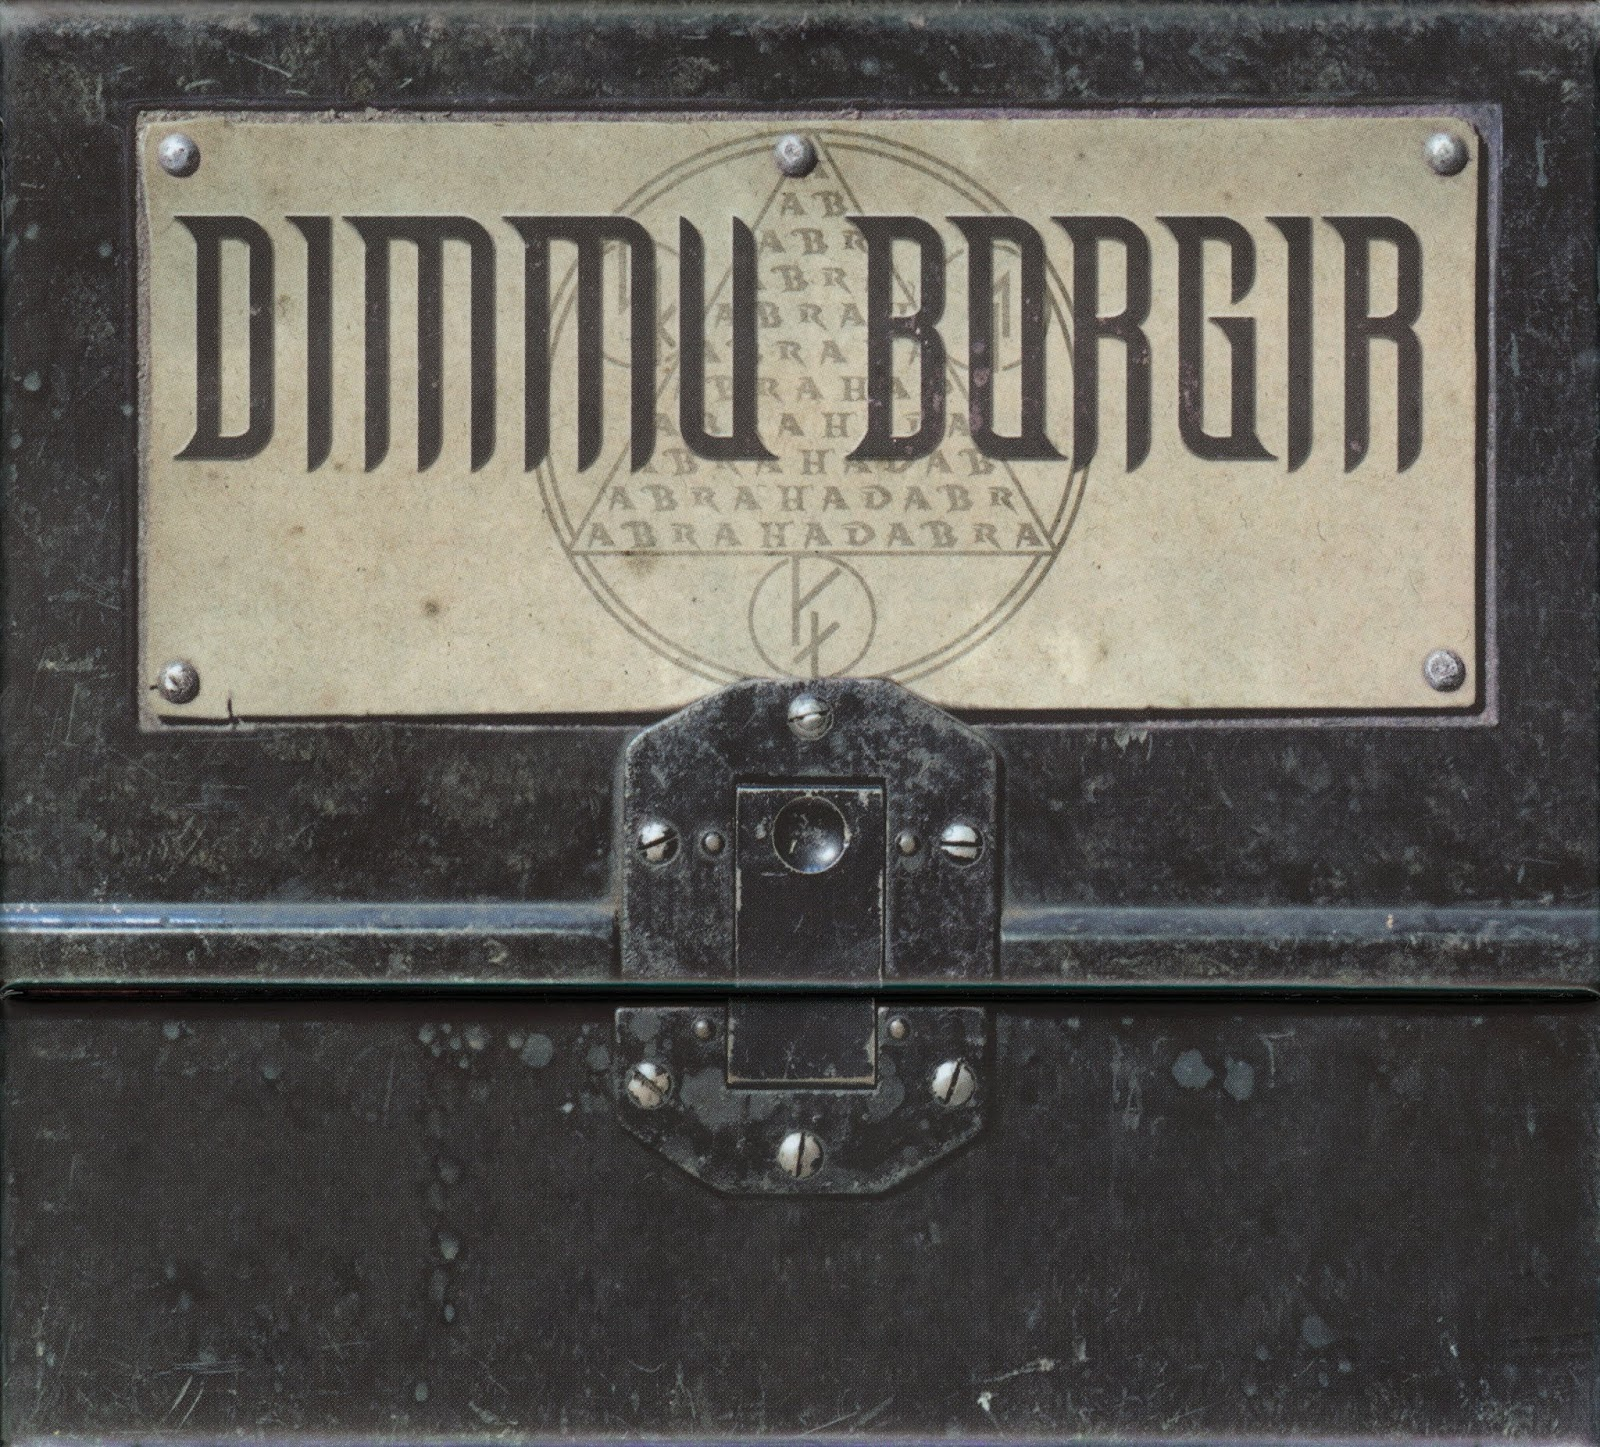 Dimmu Borgir — Abrahadabra (2010)